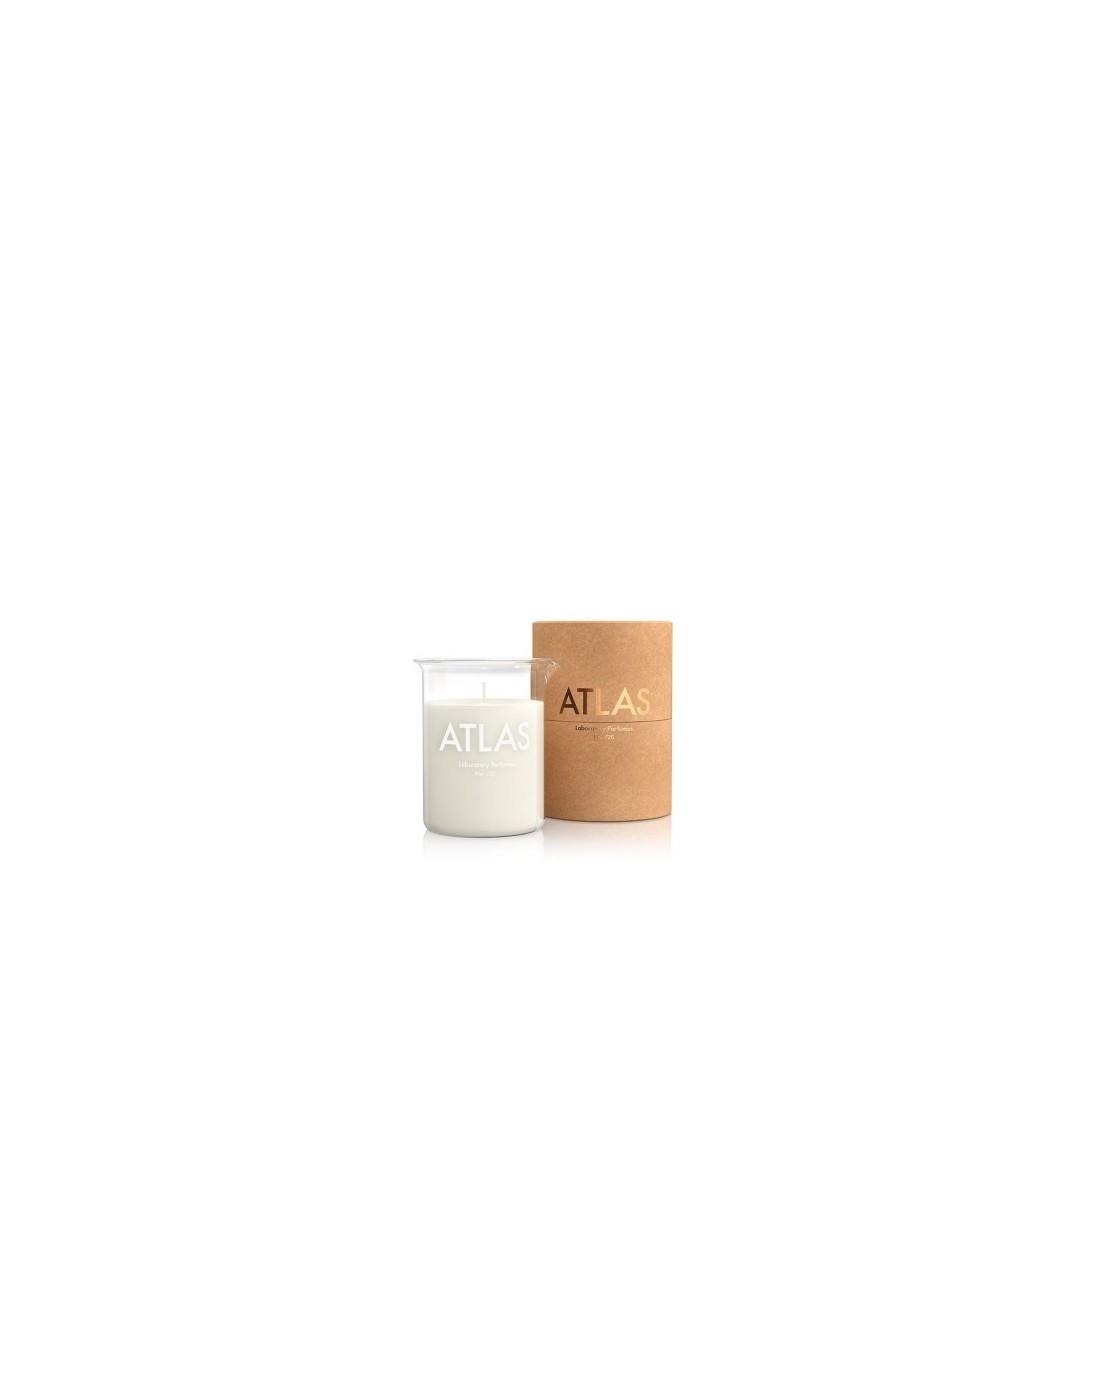 LaboratoryÊ Perfumes Atlas Candela 200g  5060385330081